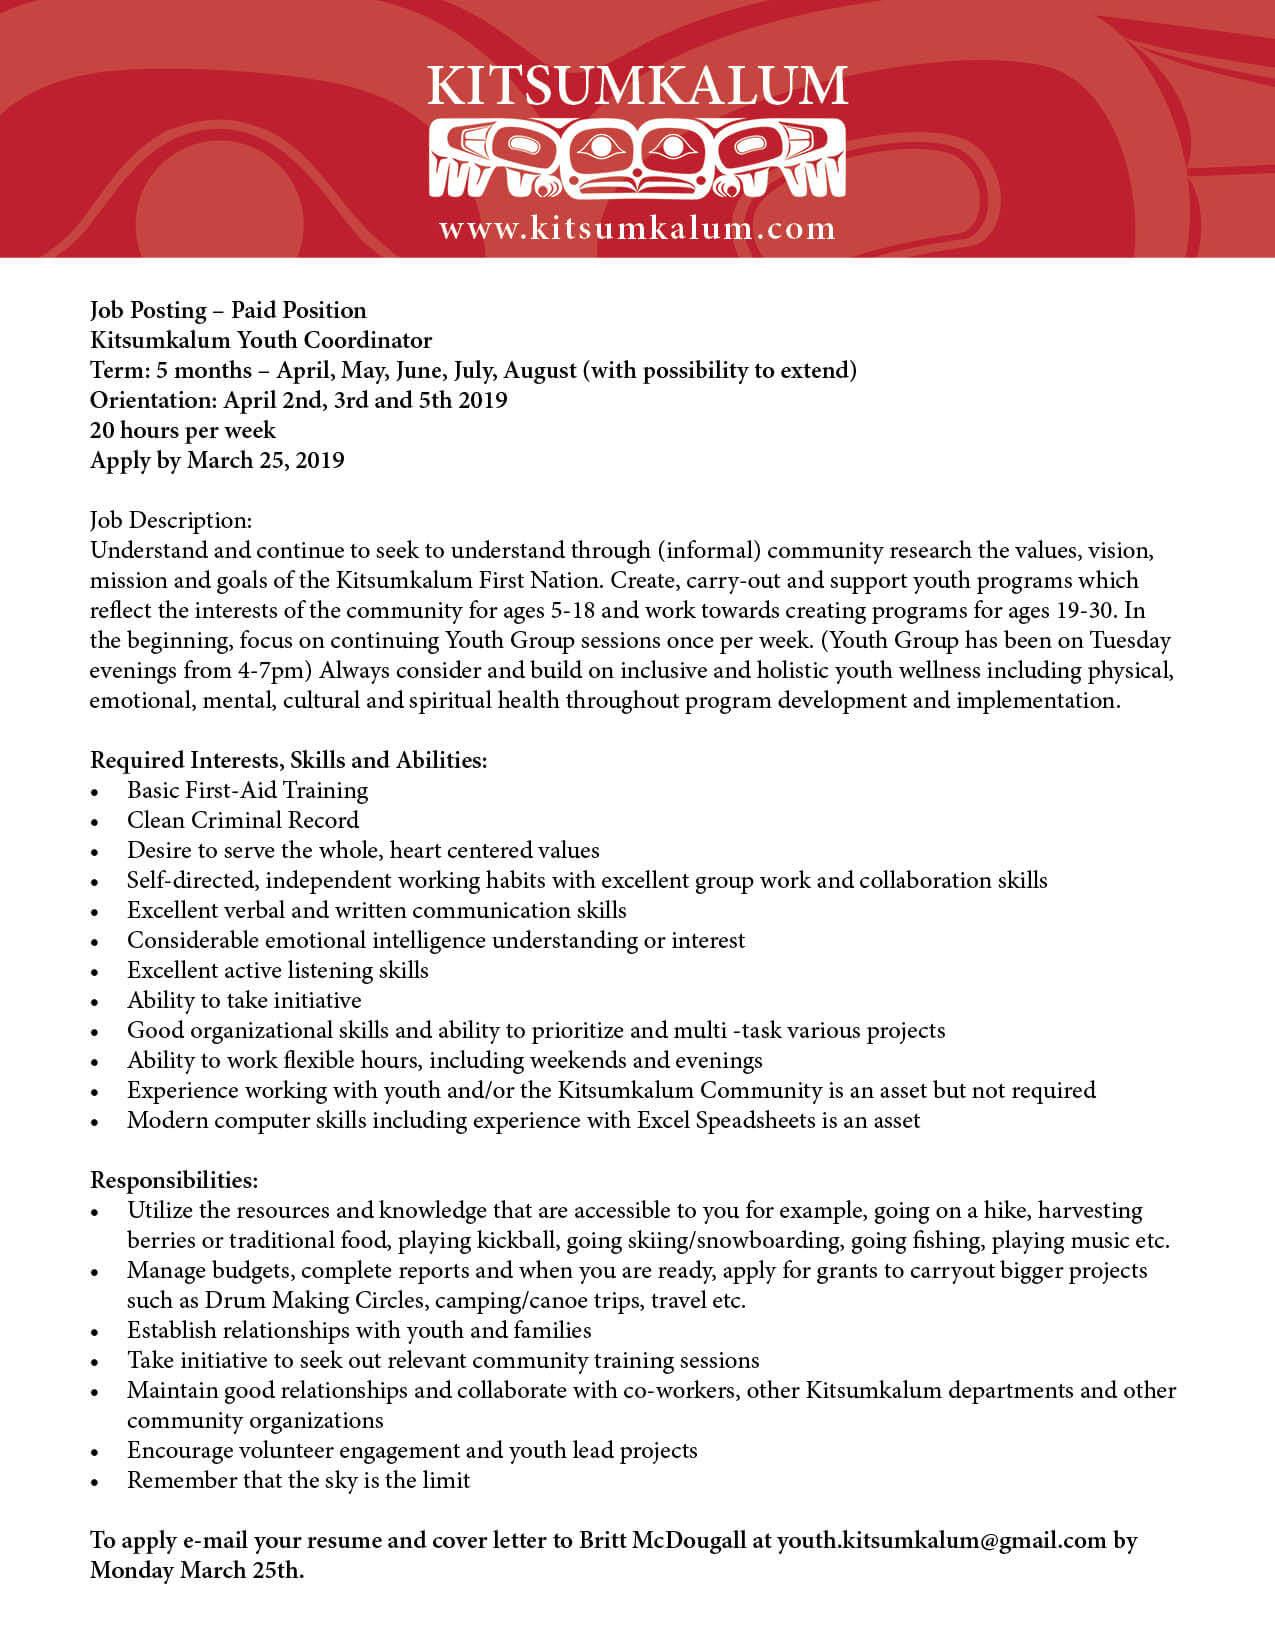 Job Opportunity – Kitsumkalum Youth Coordinator